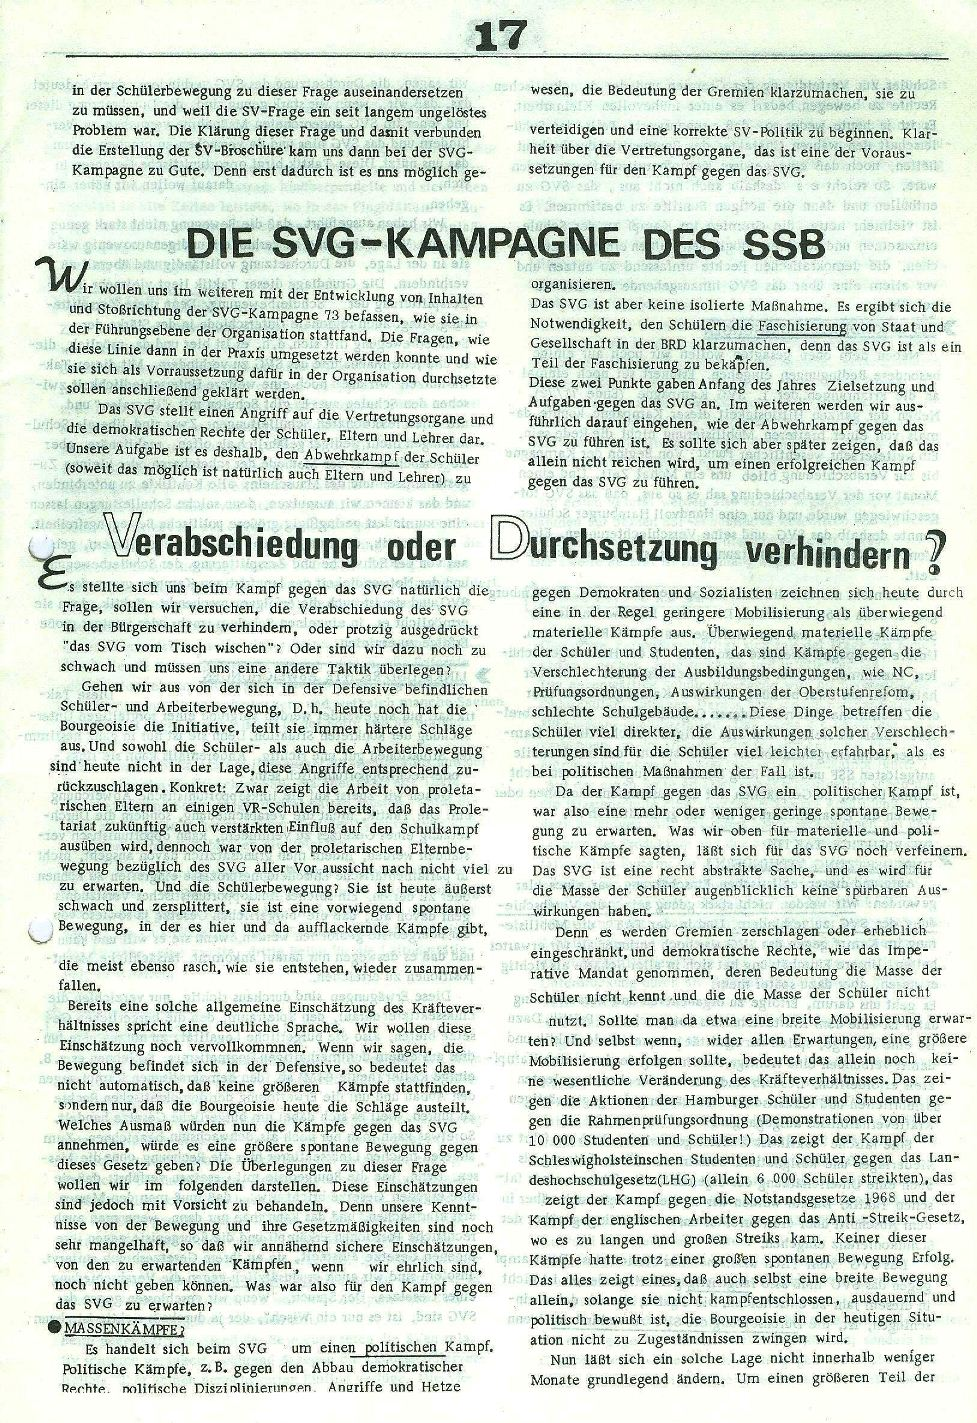 Hamburg_SSB134